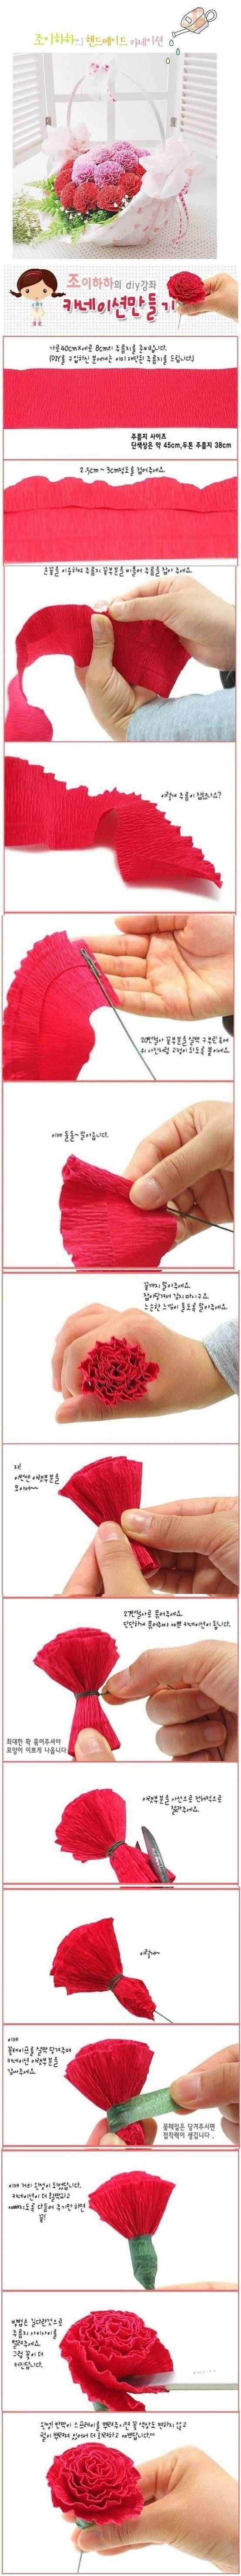 DIY Beautiful Crepe Paper Carnation | iCreativeIdeas.com LIKE Us on Facebook ==> https://www.facebook.com/icreativeideas